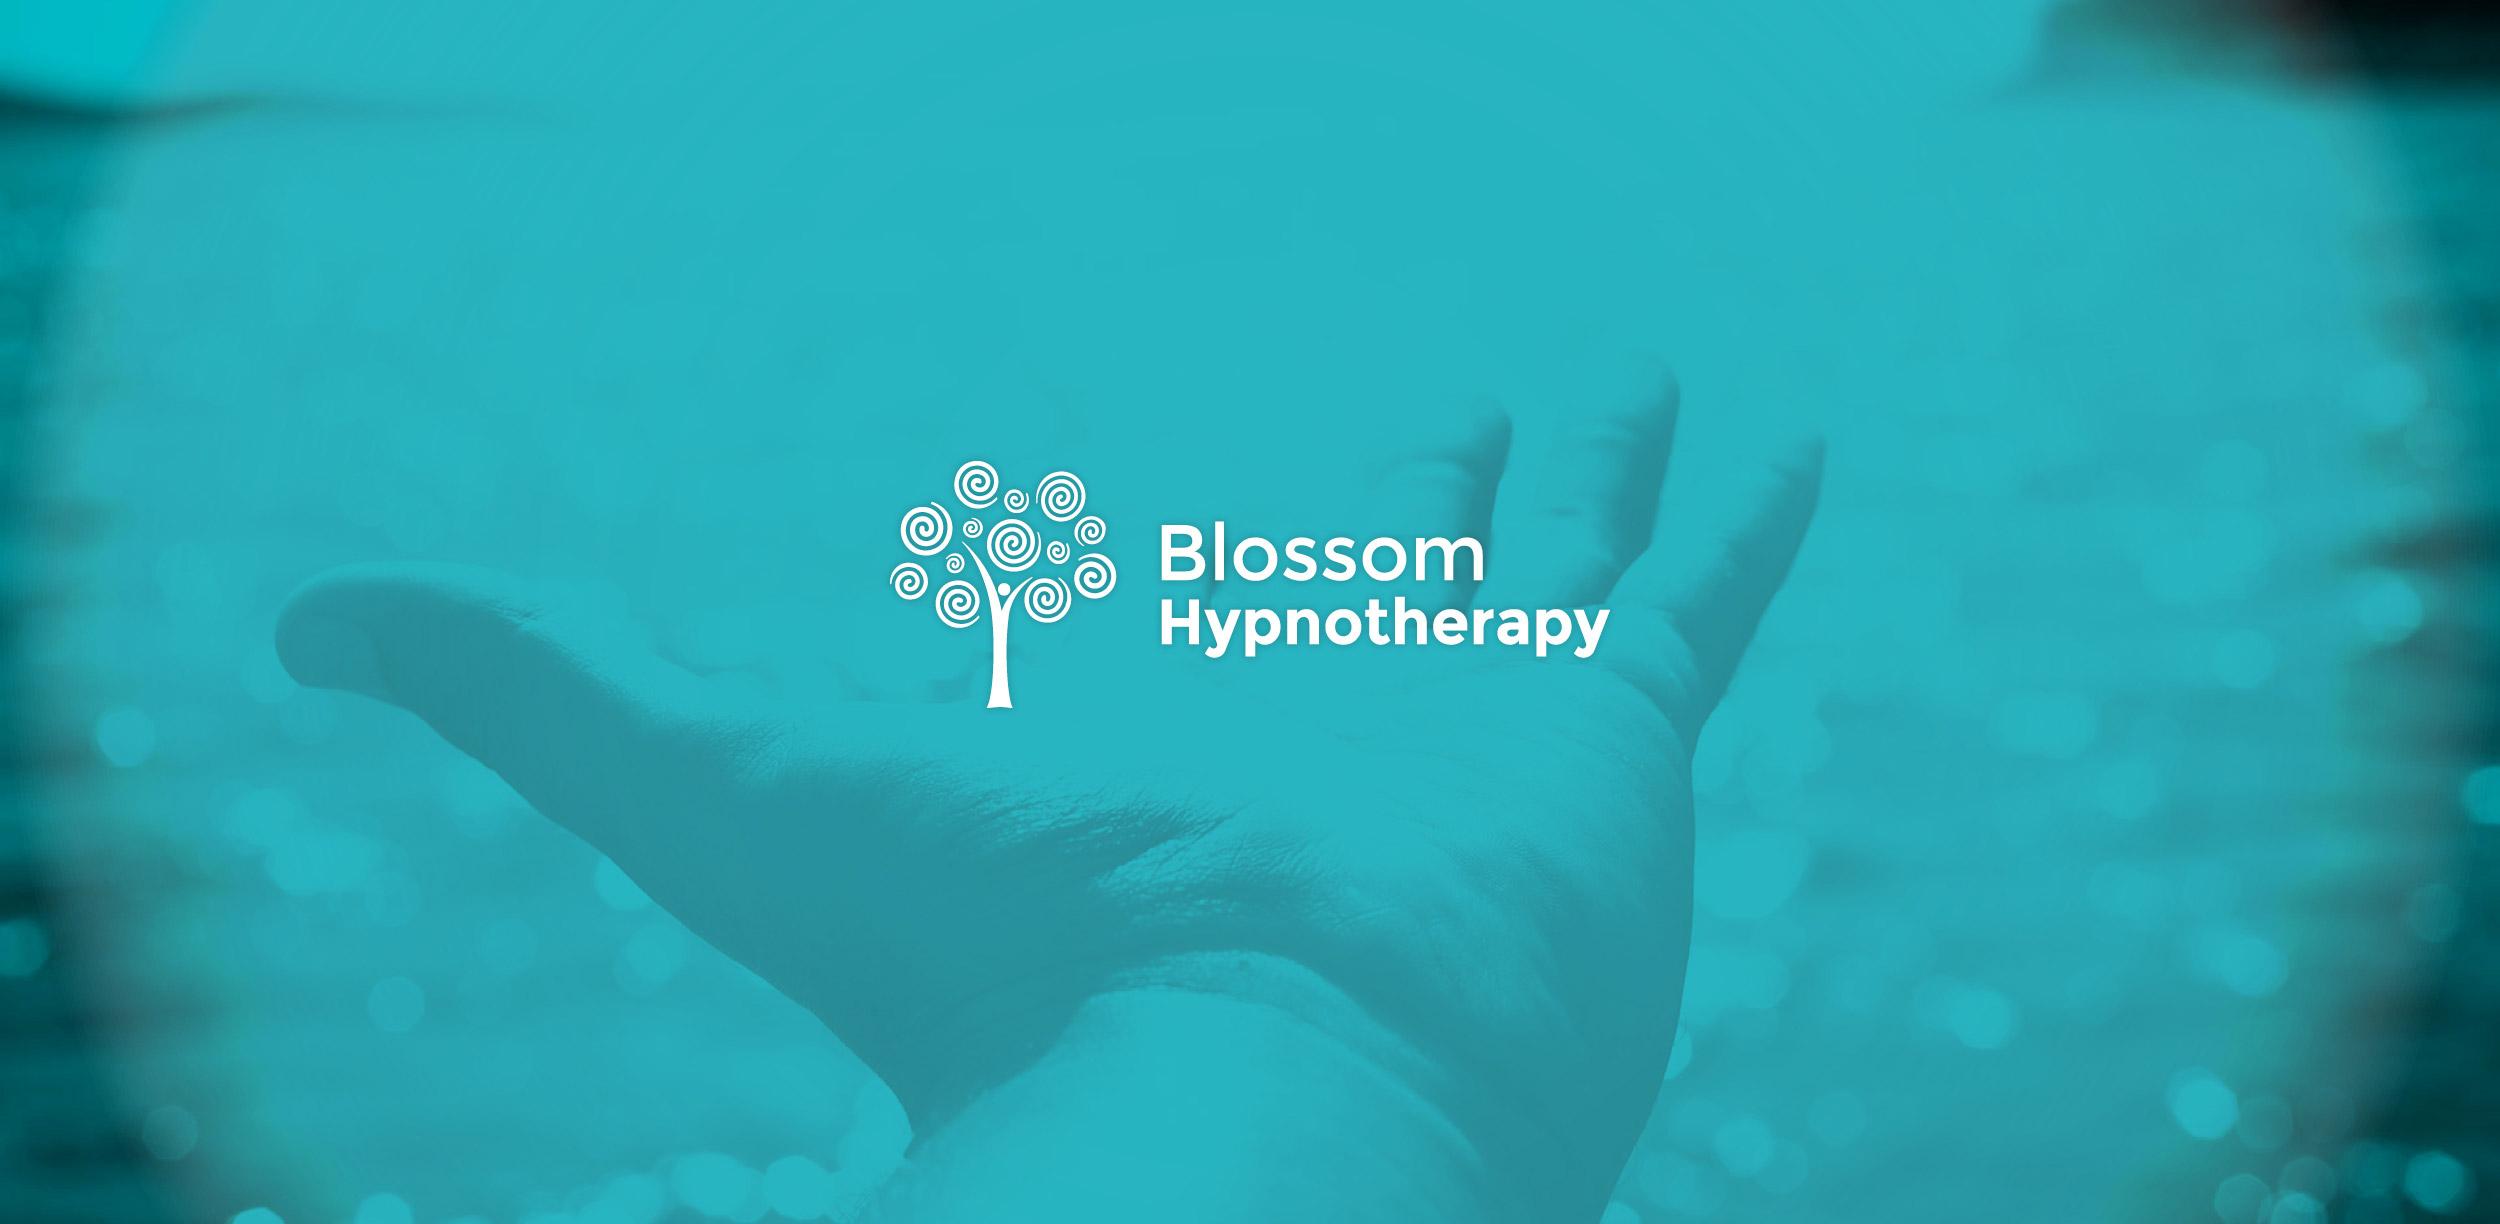 Blossom Hypnotherapy logo